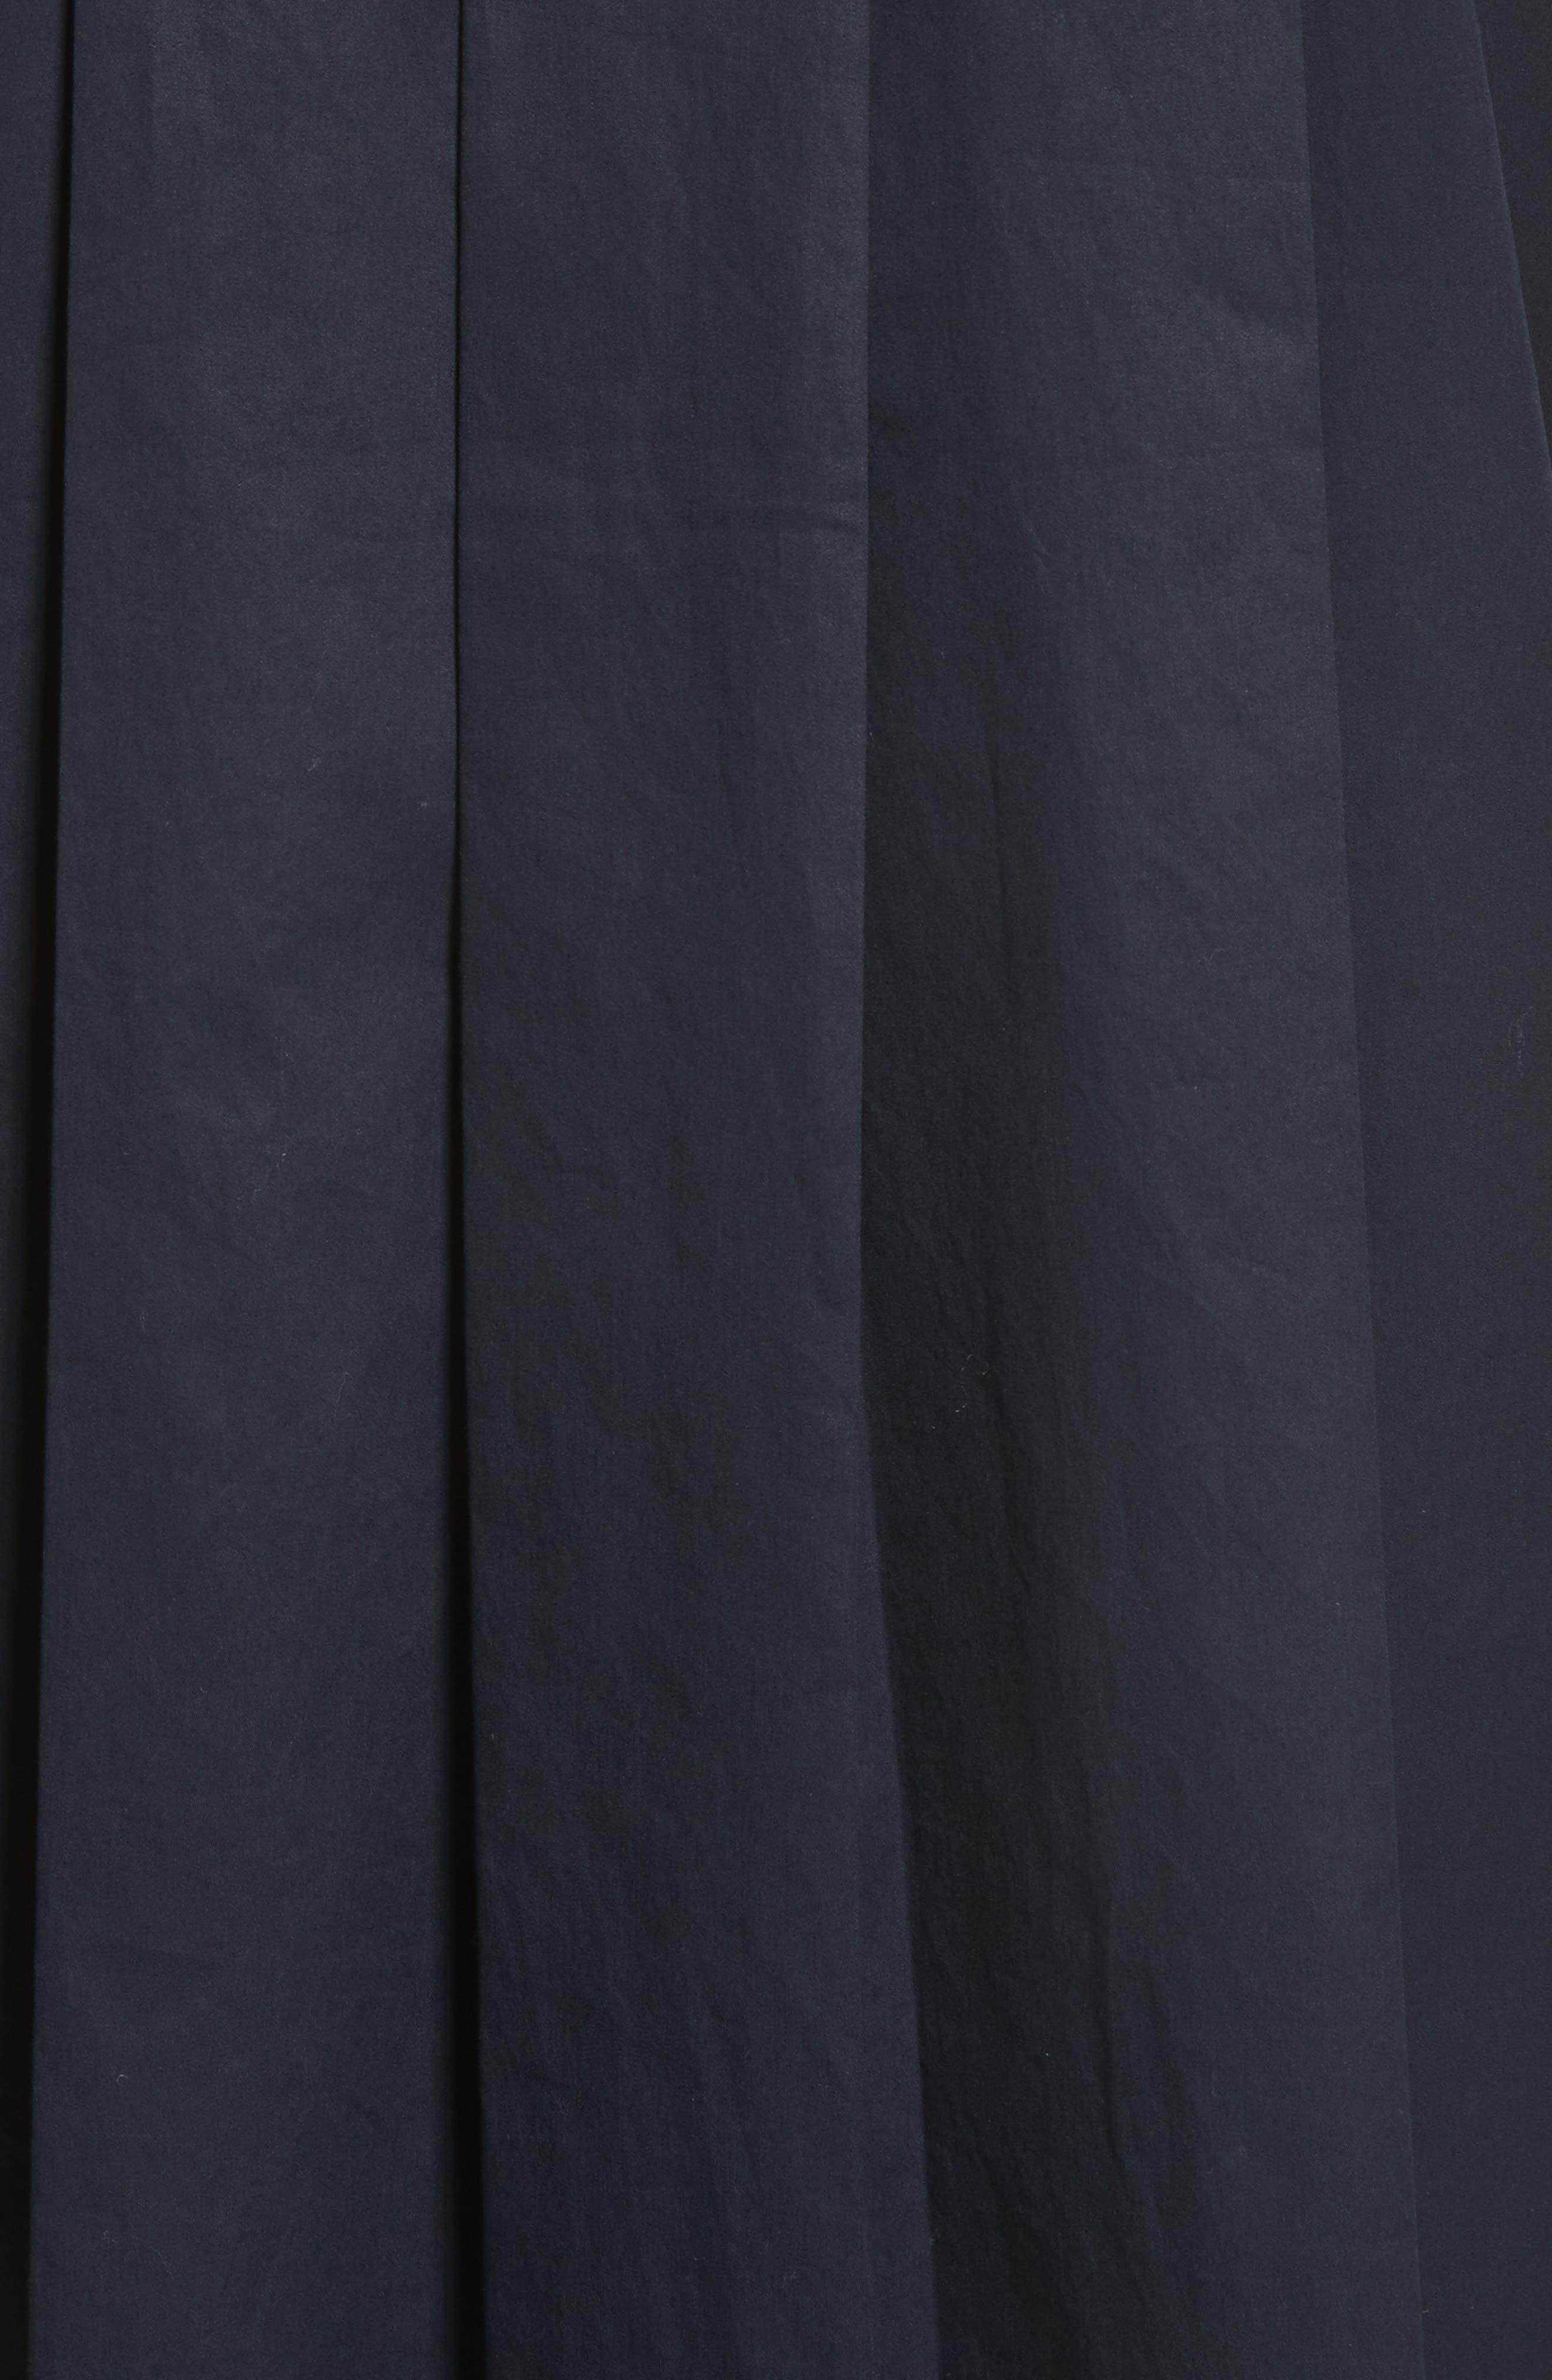 Carmine Cotton Shirtdress,                             Alternate thumbnail 5, color,                             005